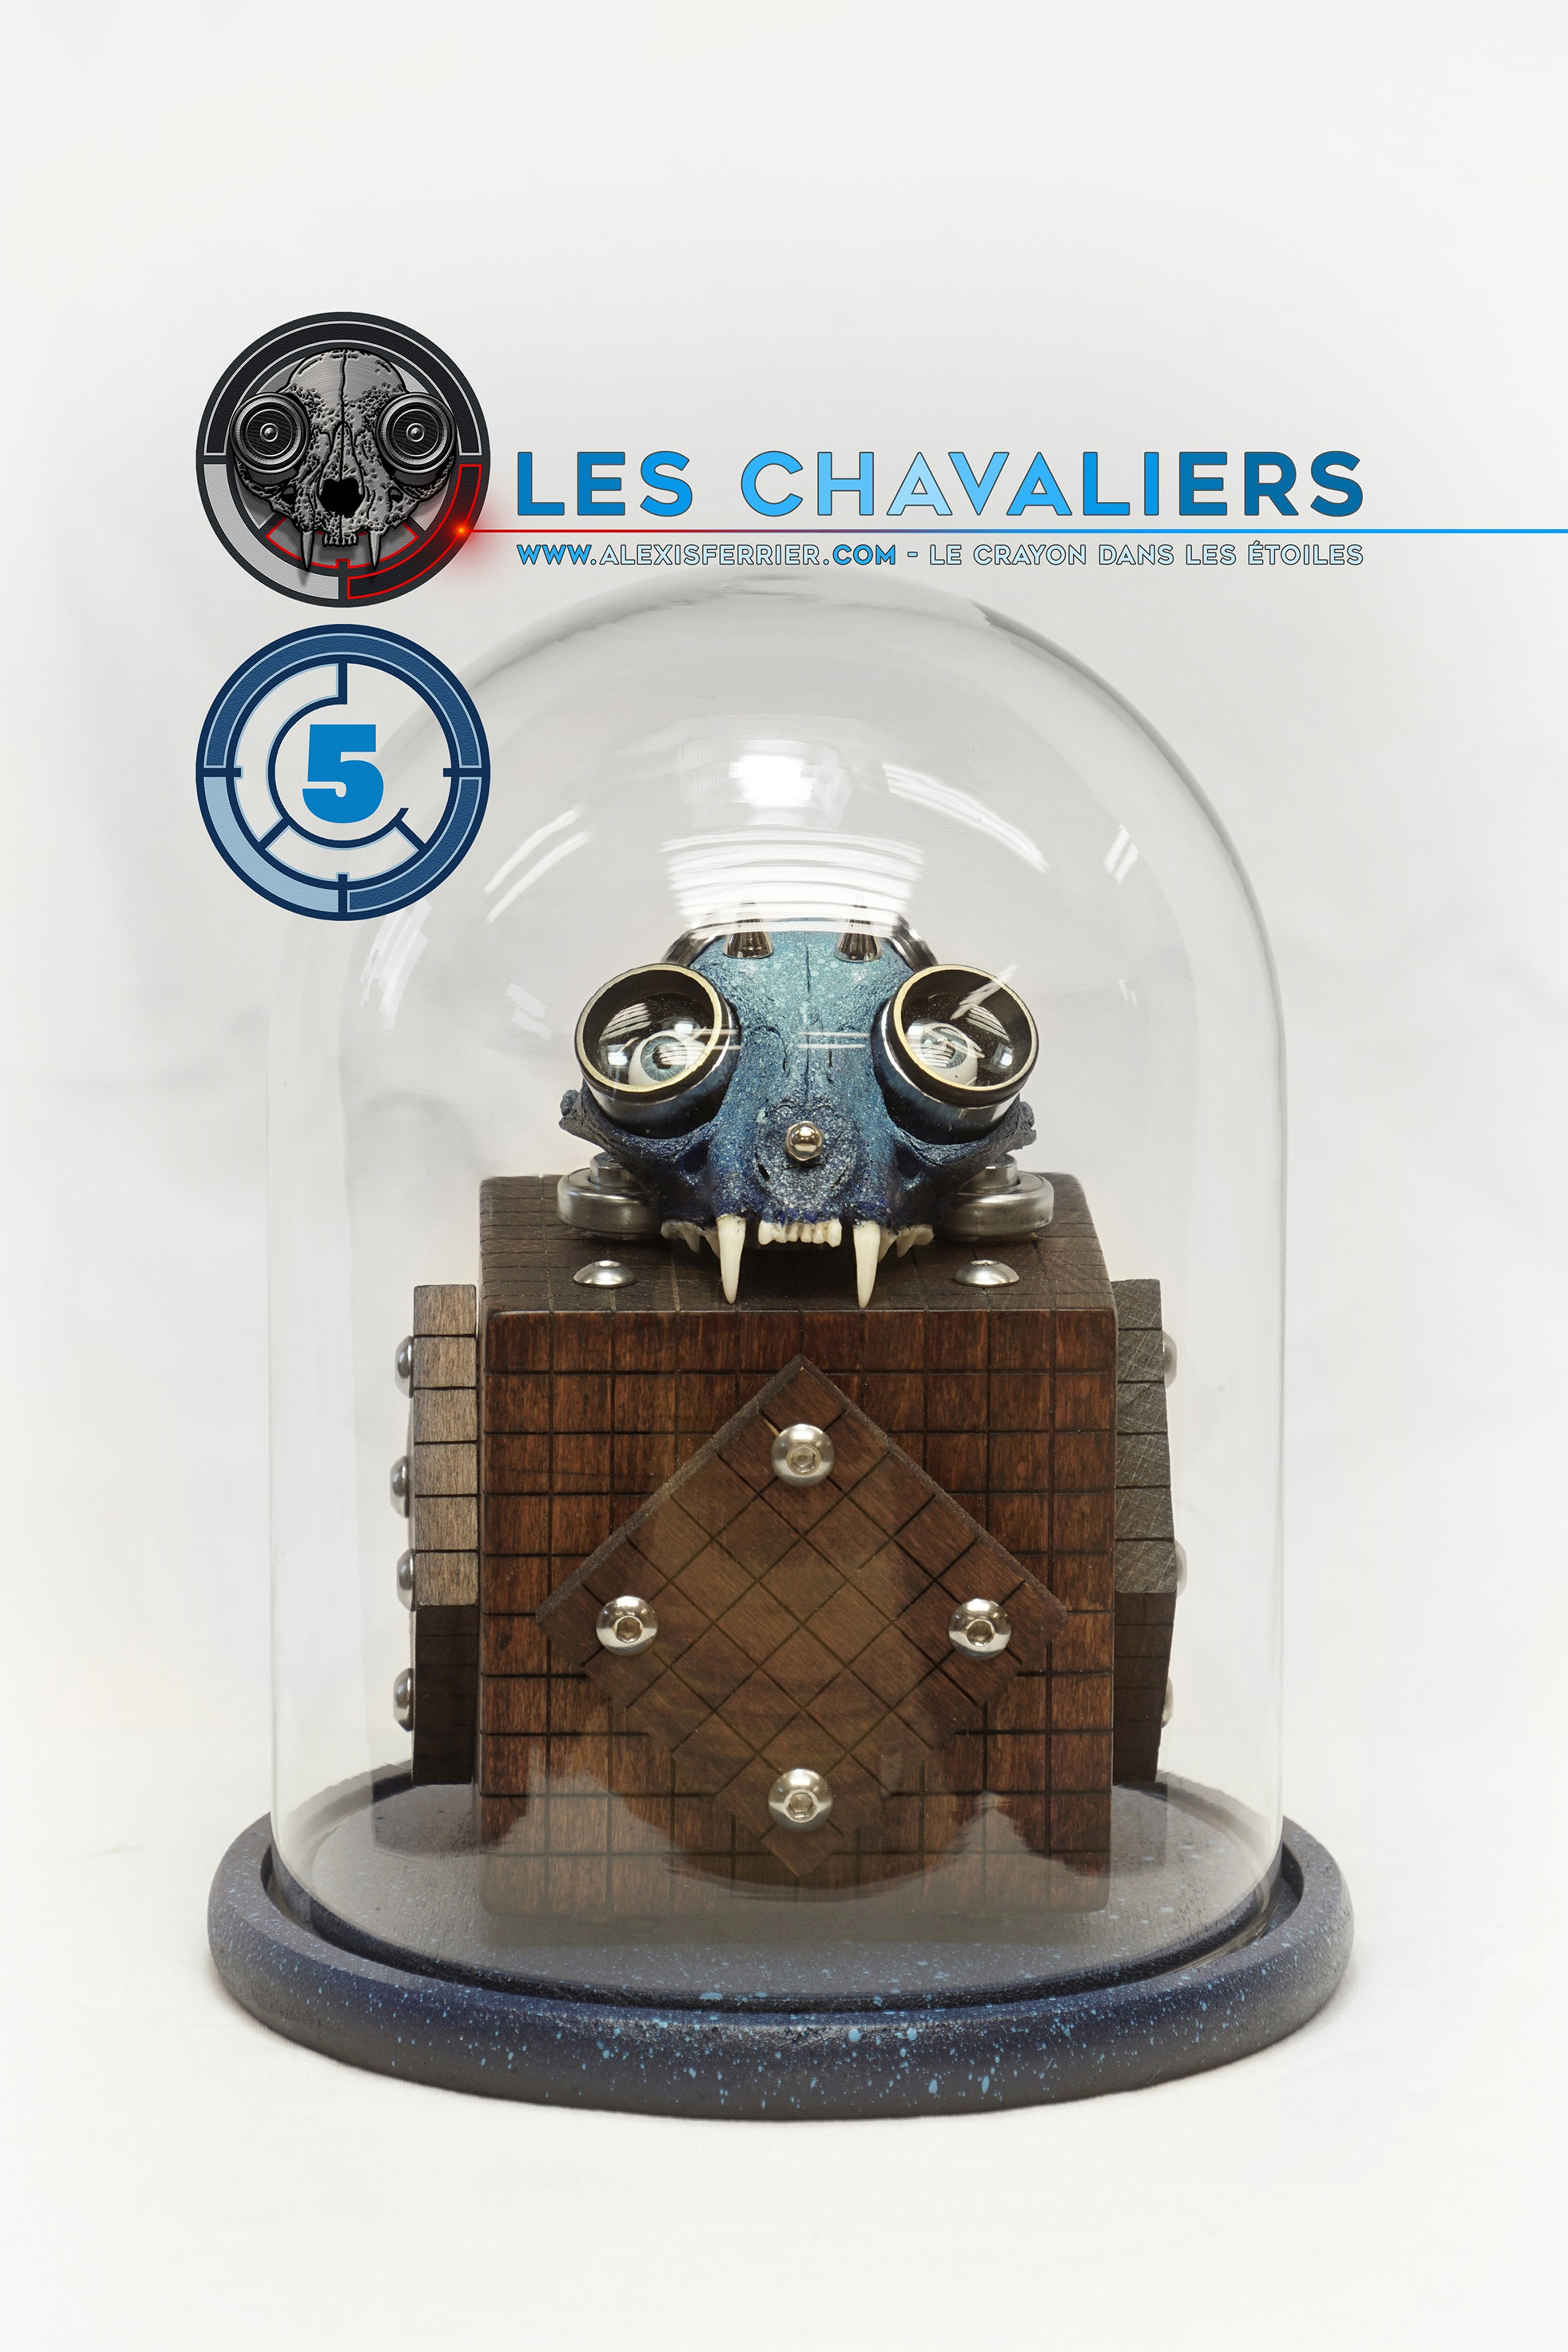 Chavalier 5b